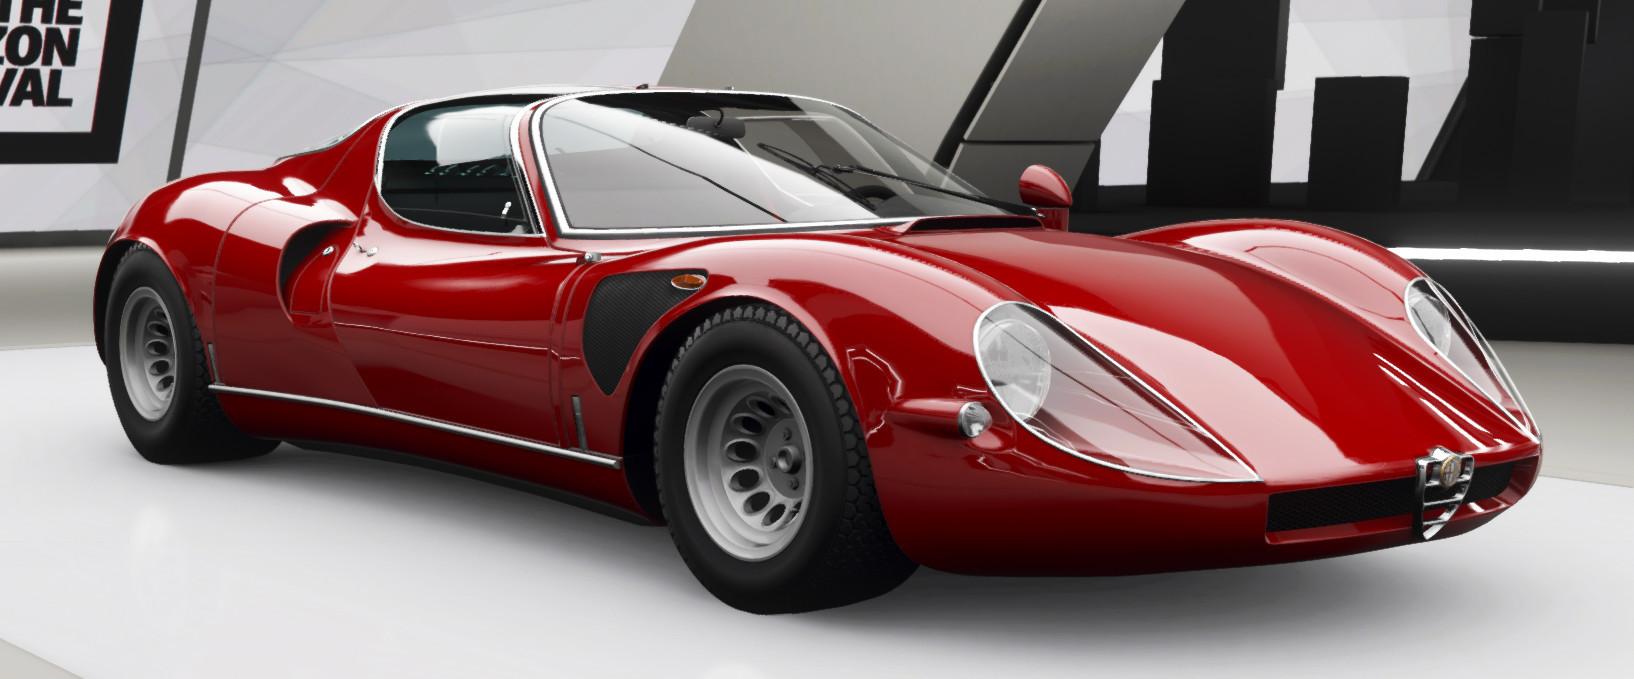 picture of the Alfa Romeo 33 Stradale in Forza Horizon 4